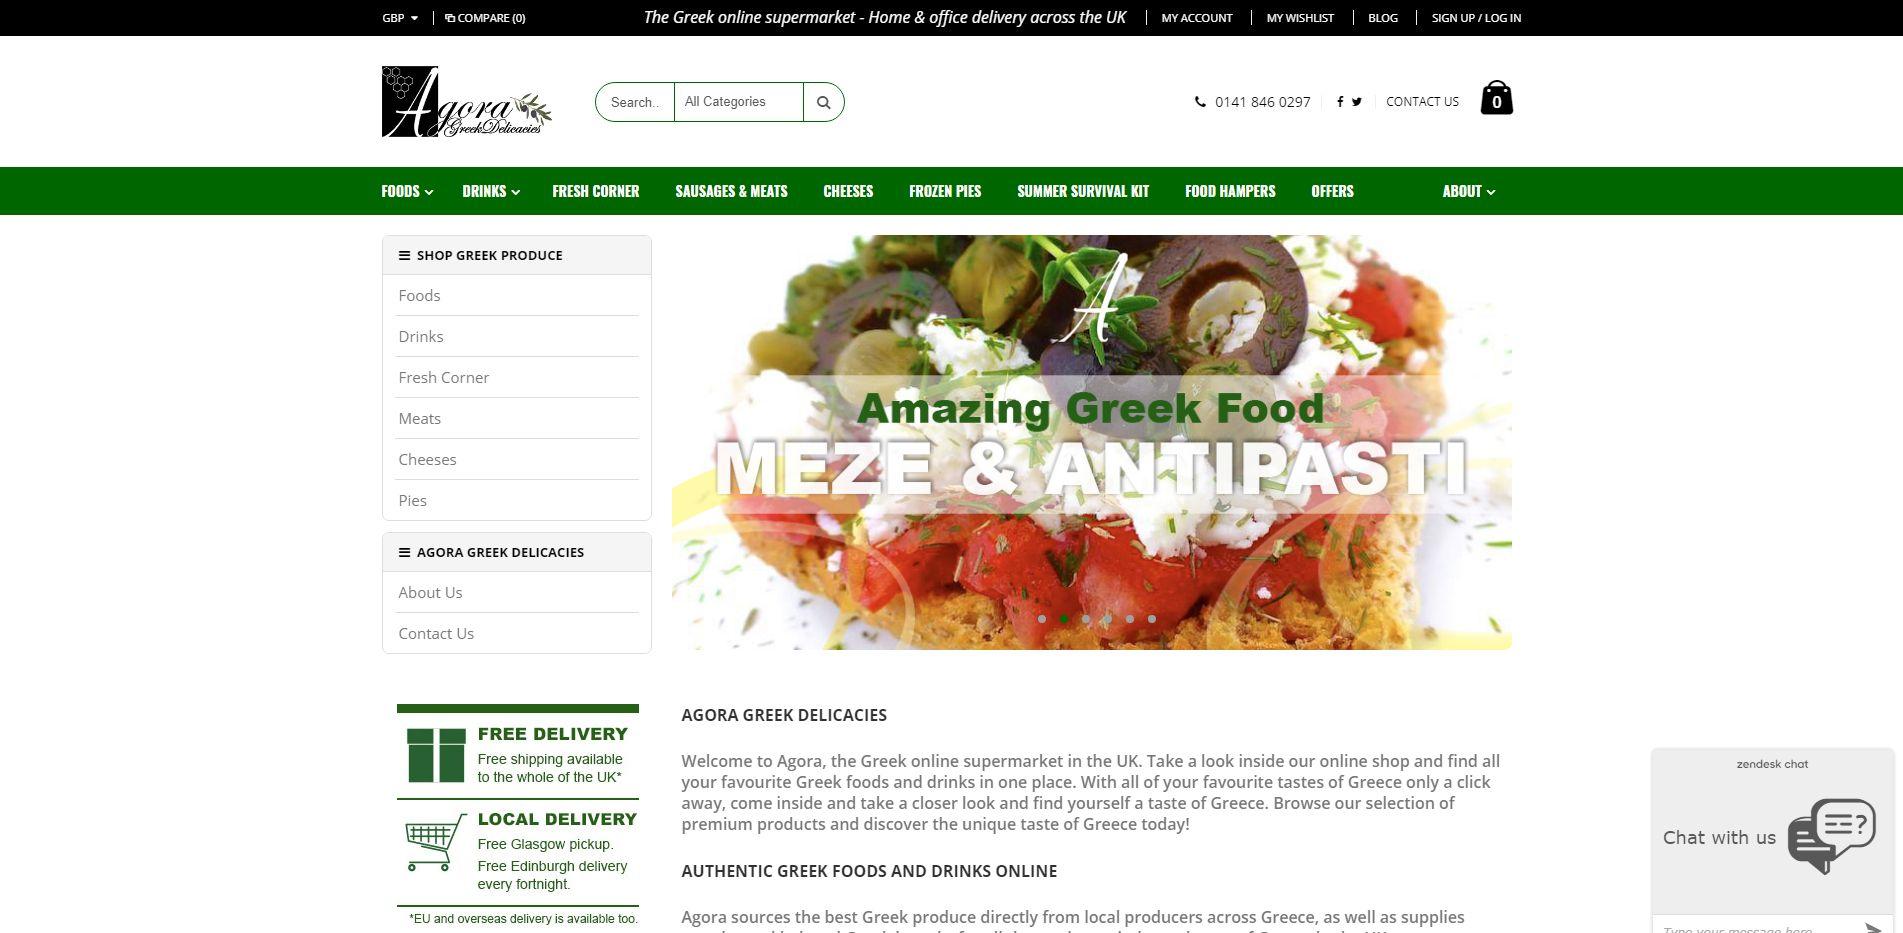 Buy-Authentic-Greek-Foods-Drinks-Online-UK-Greek-Supermarket